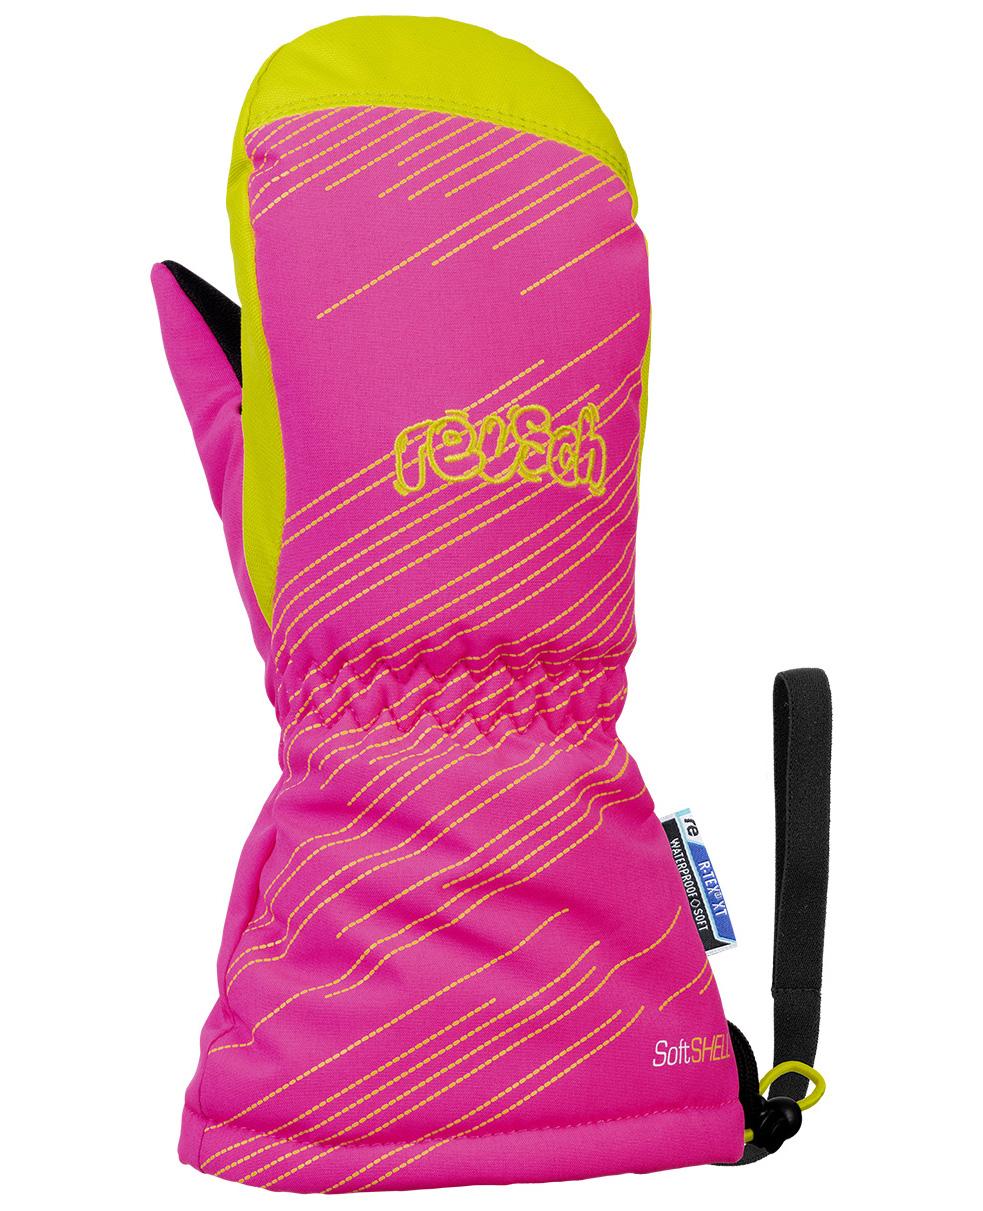 Варежки Reusch 2020-21 Maxi R-Tex® Xt Mitten Knockout Pink/Lime (Inch (Дюйм):V)